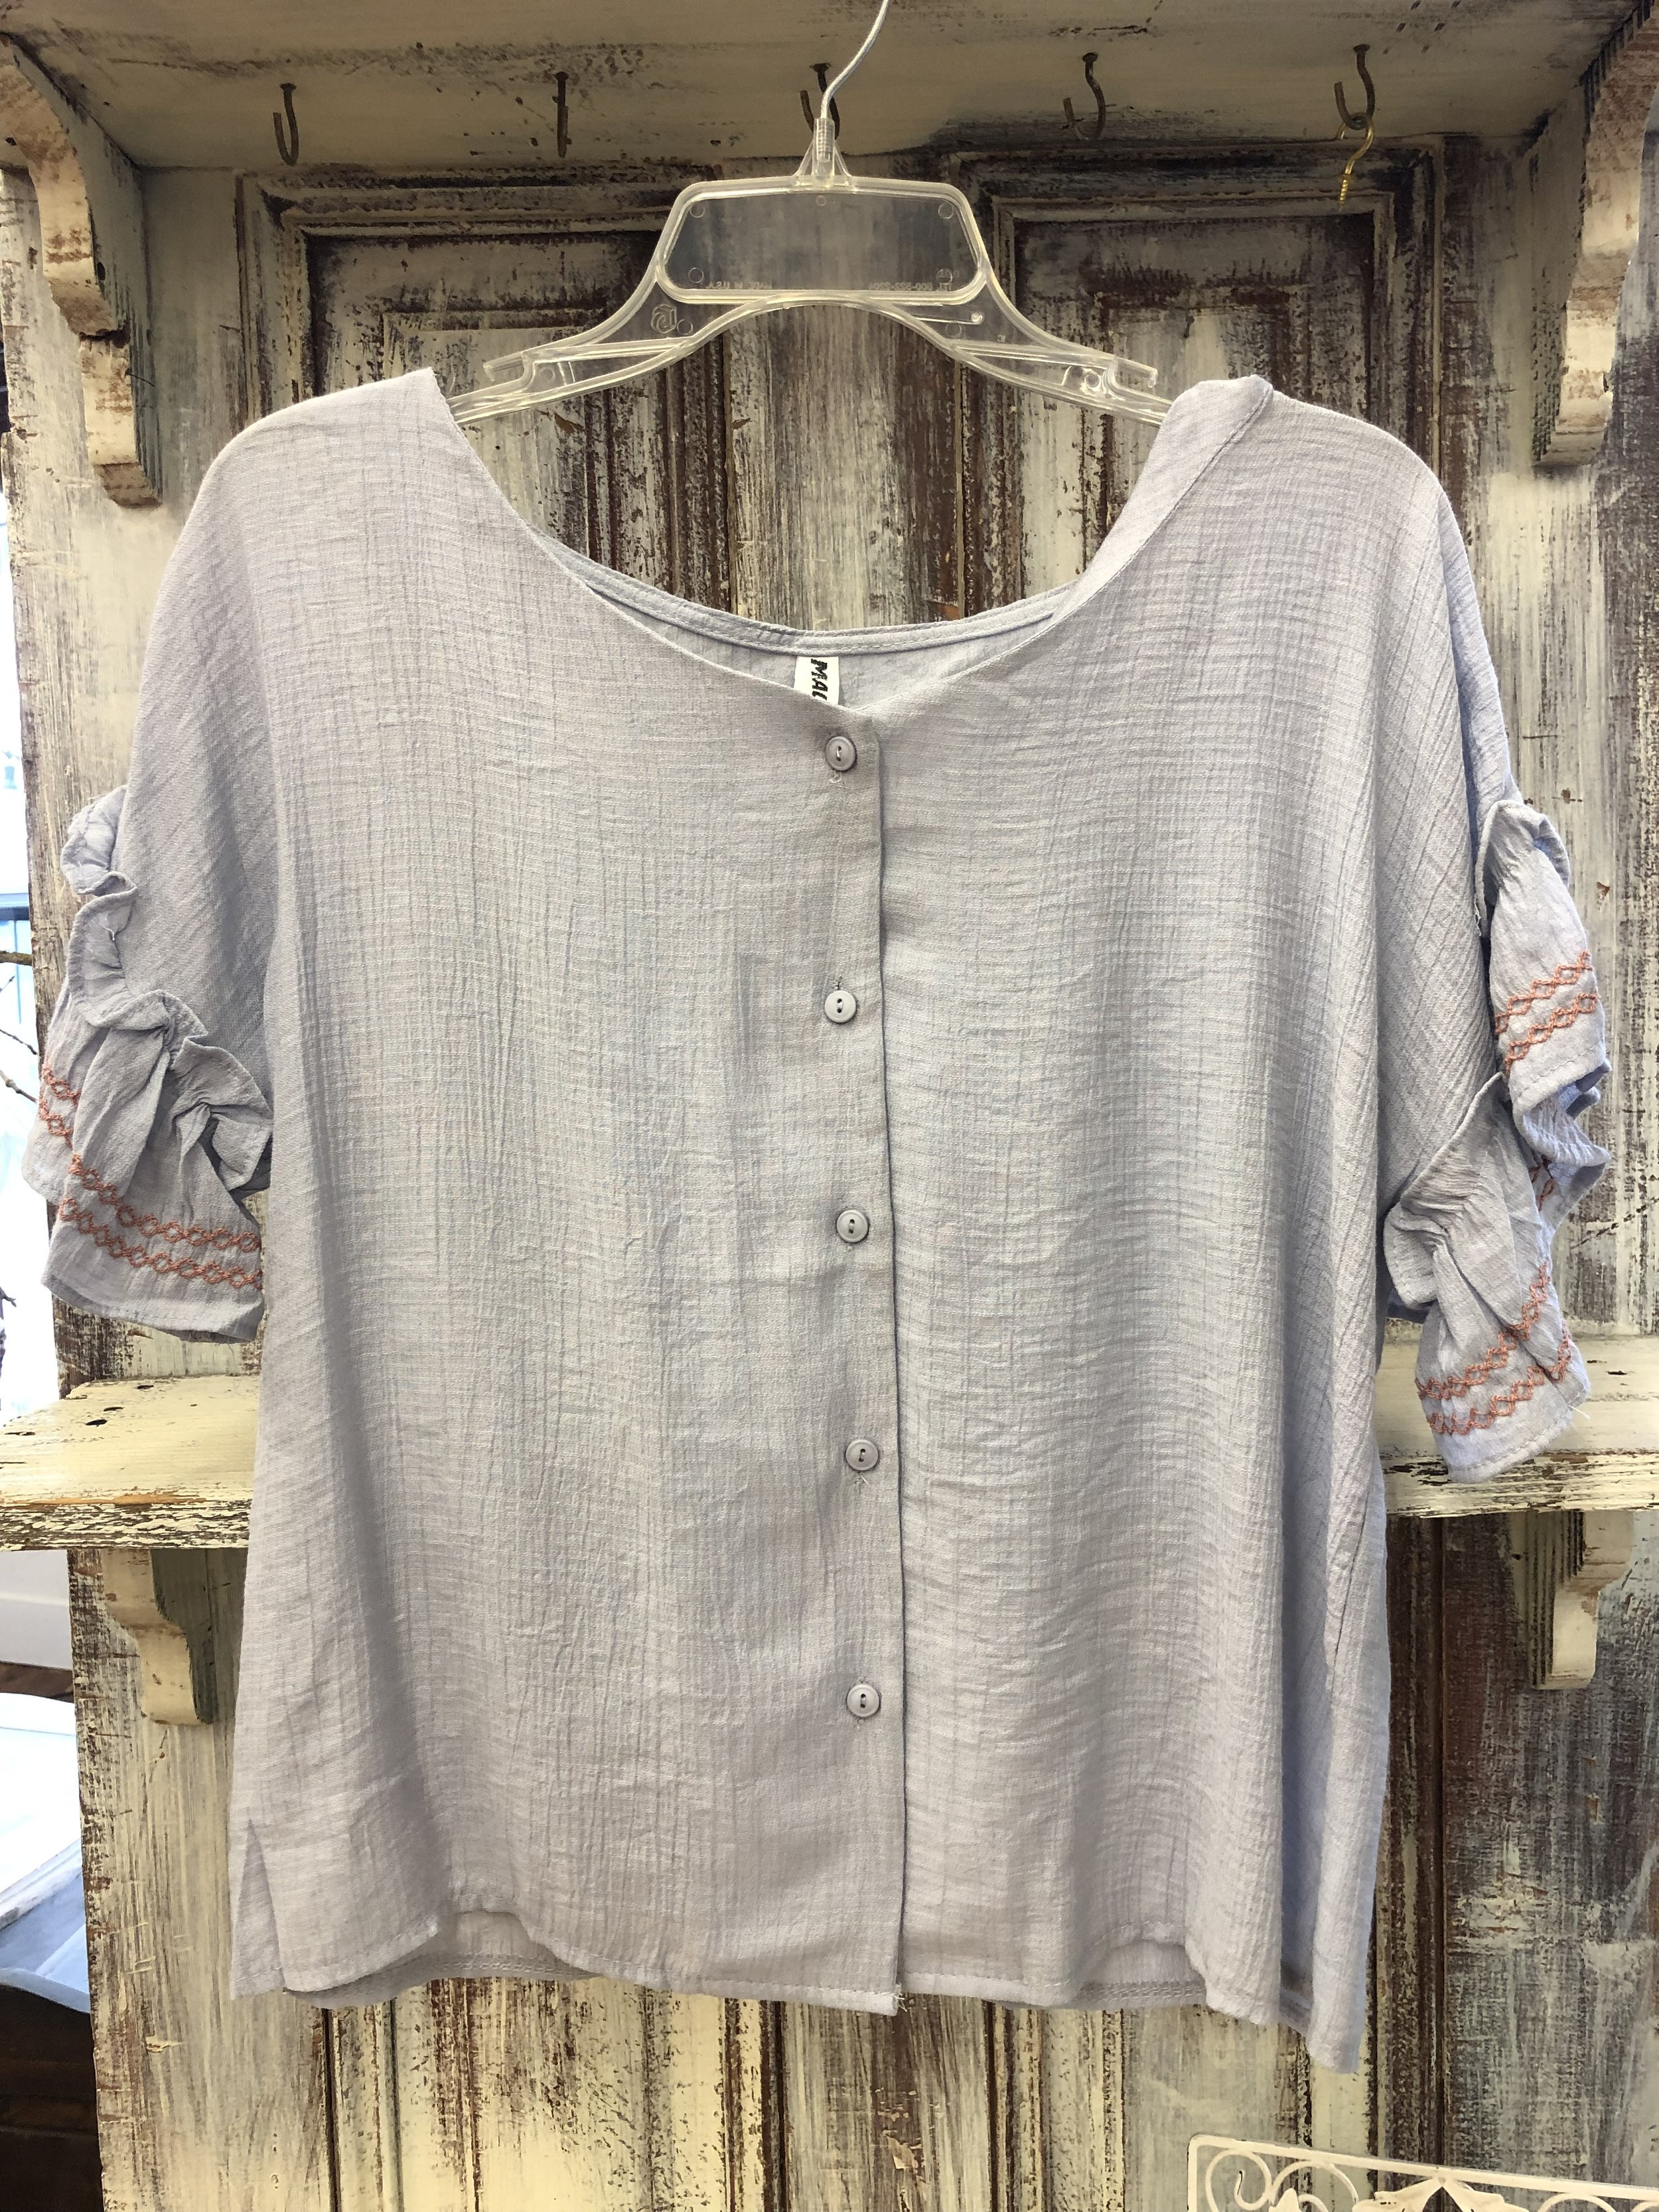 Malianni Embroidered - One Size-$27.99